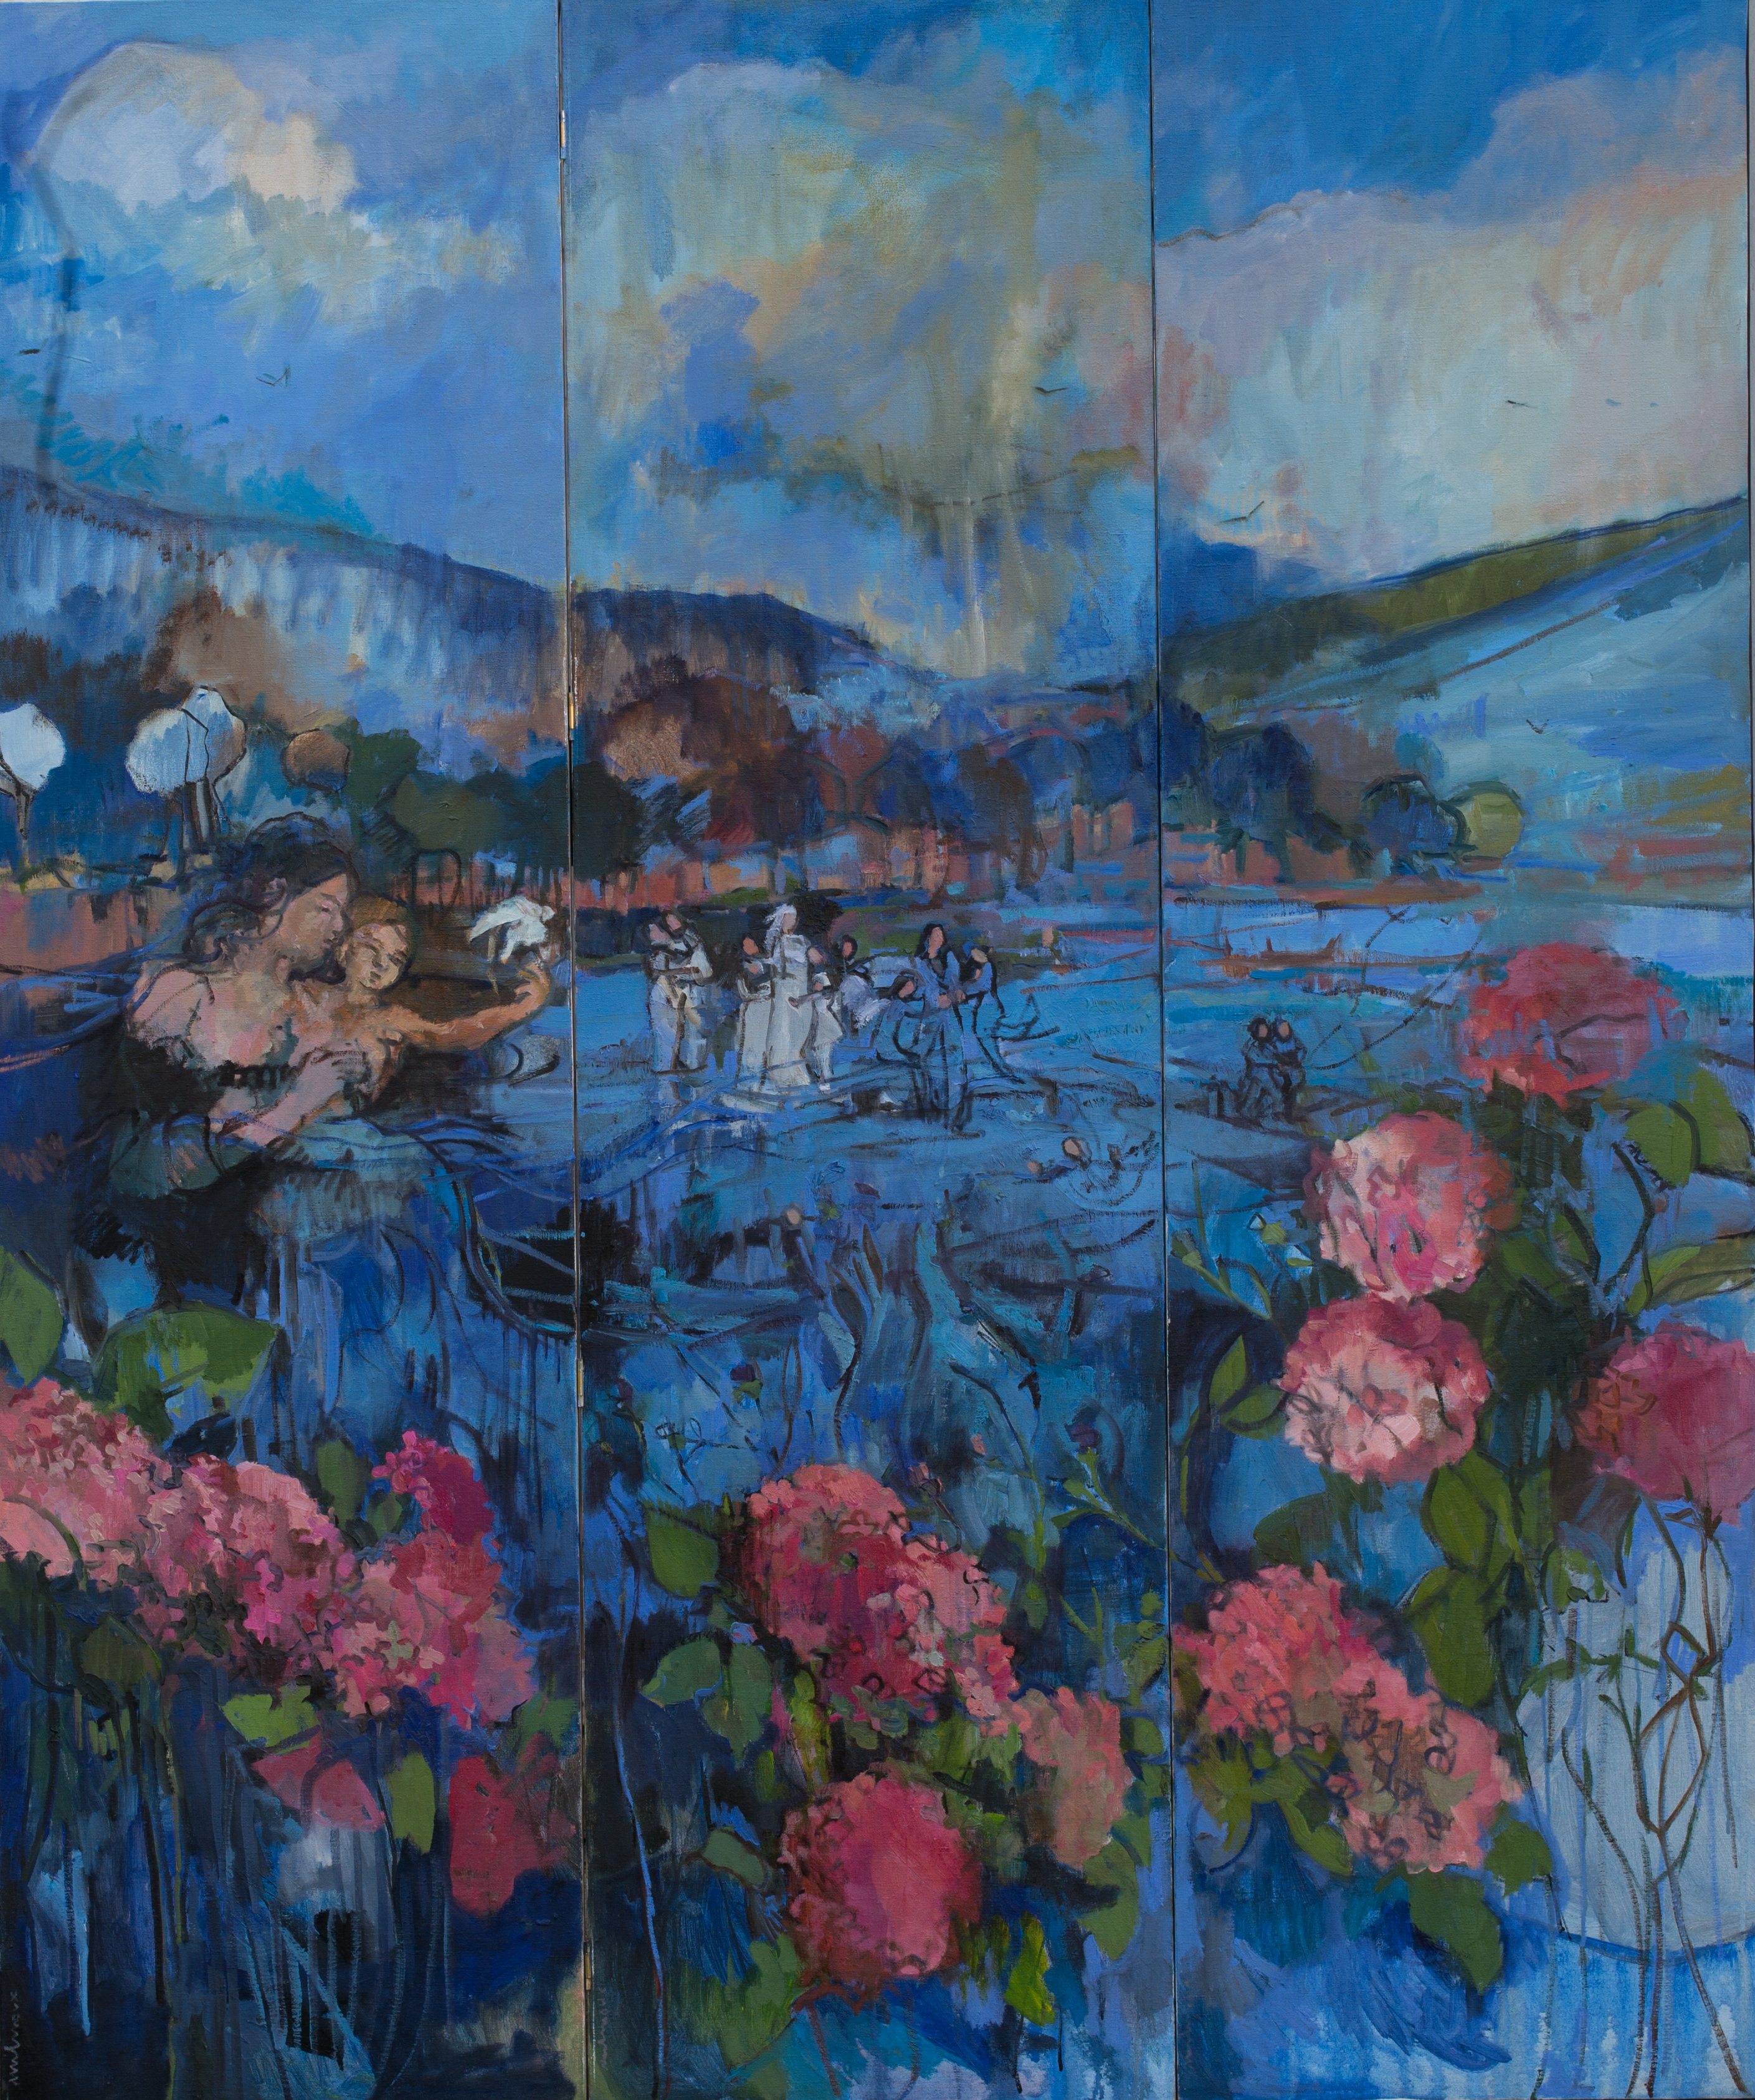 carole melmoux, may's weedind, oil on canevas, 150x180.jpg